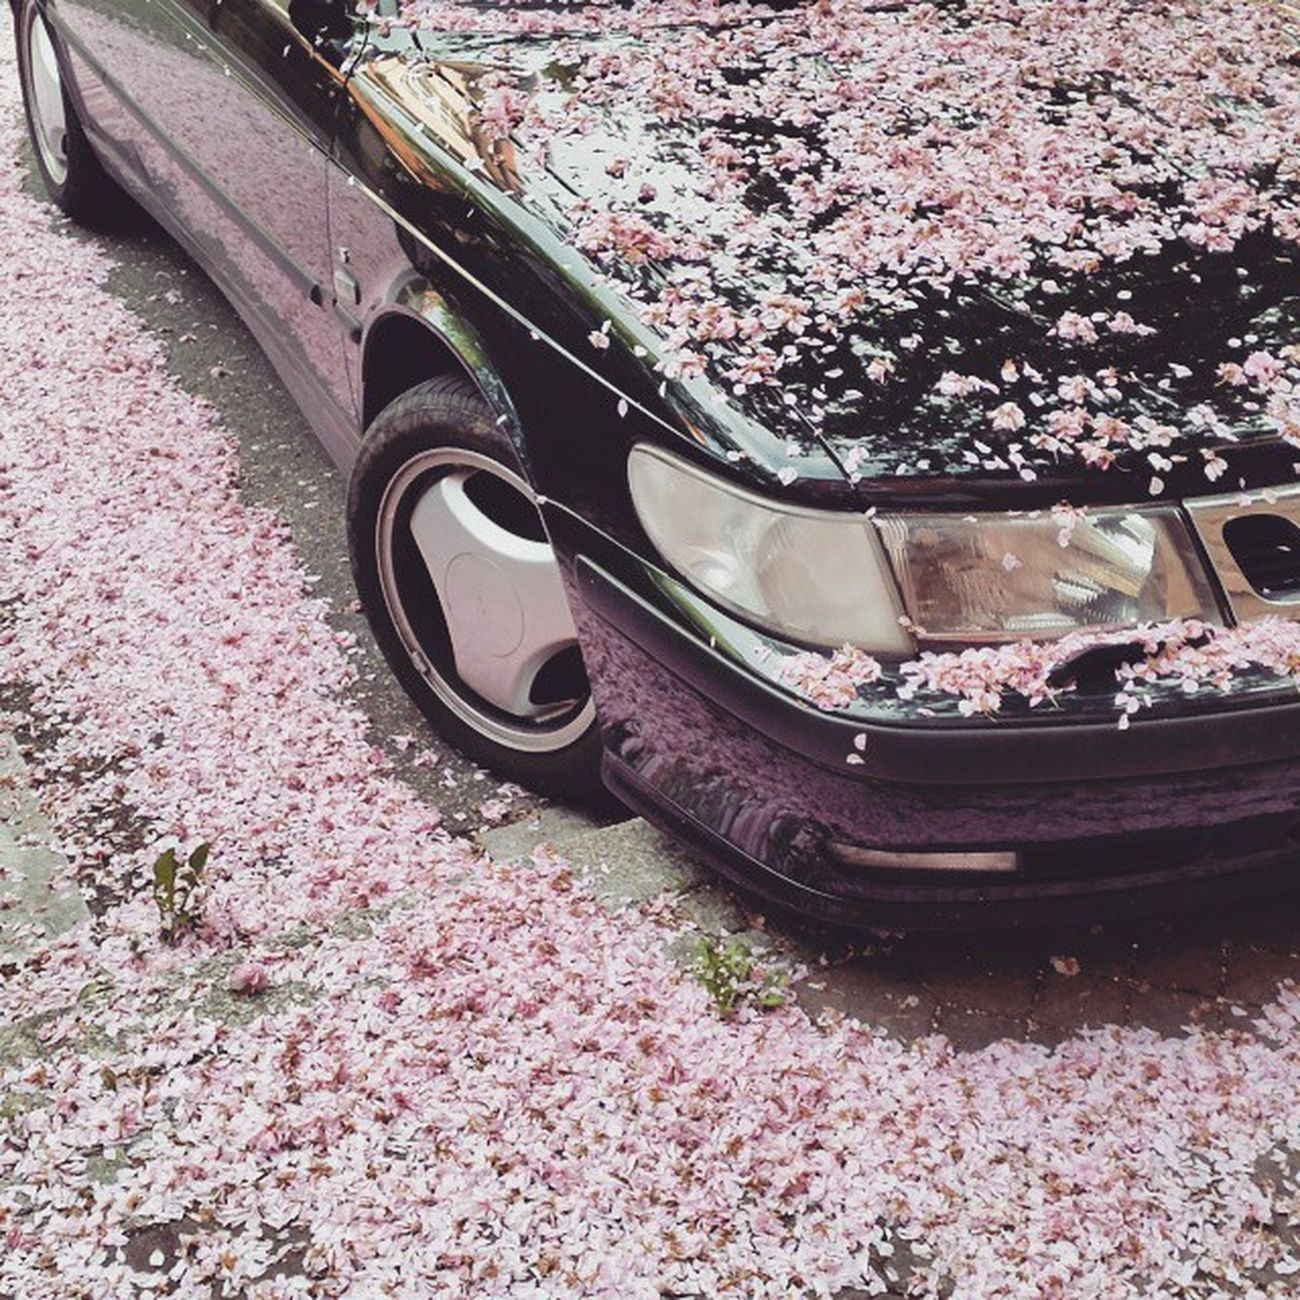 VSCO Vscocam Saab Spring Cherryblossom Car Blossom Offenburg 😚